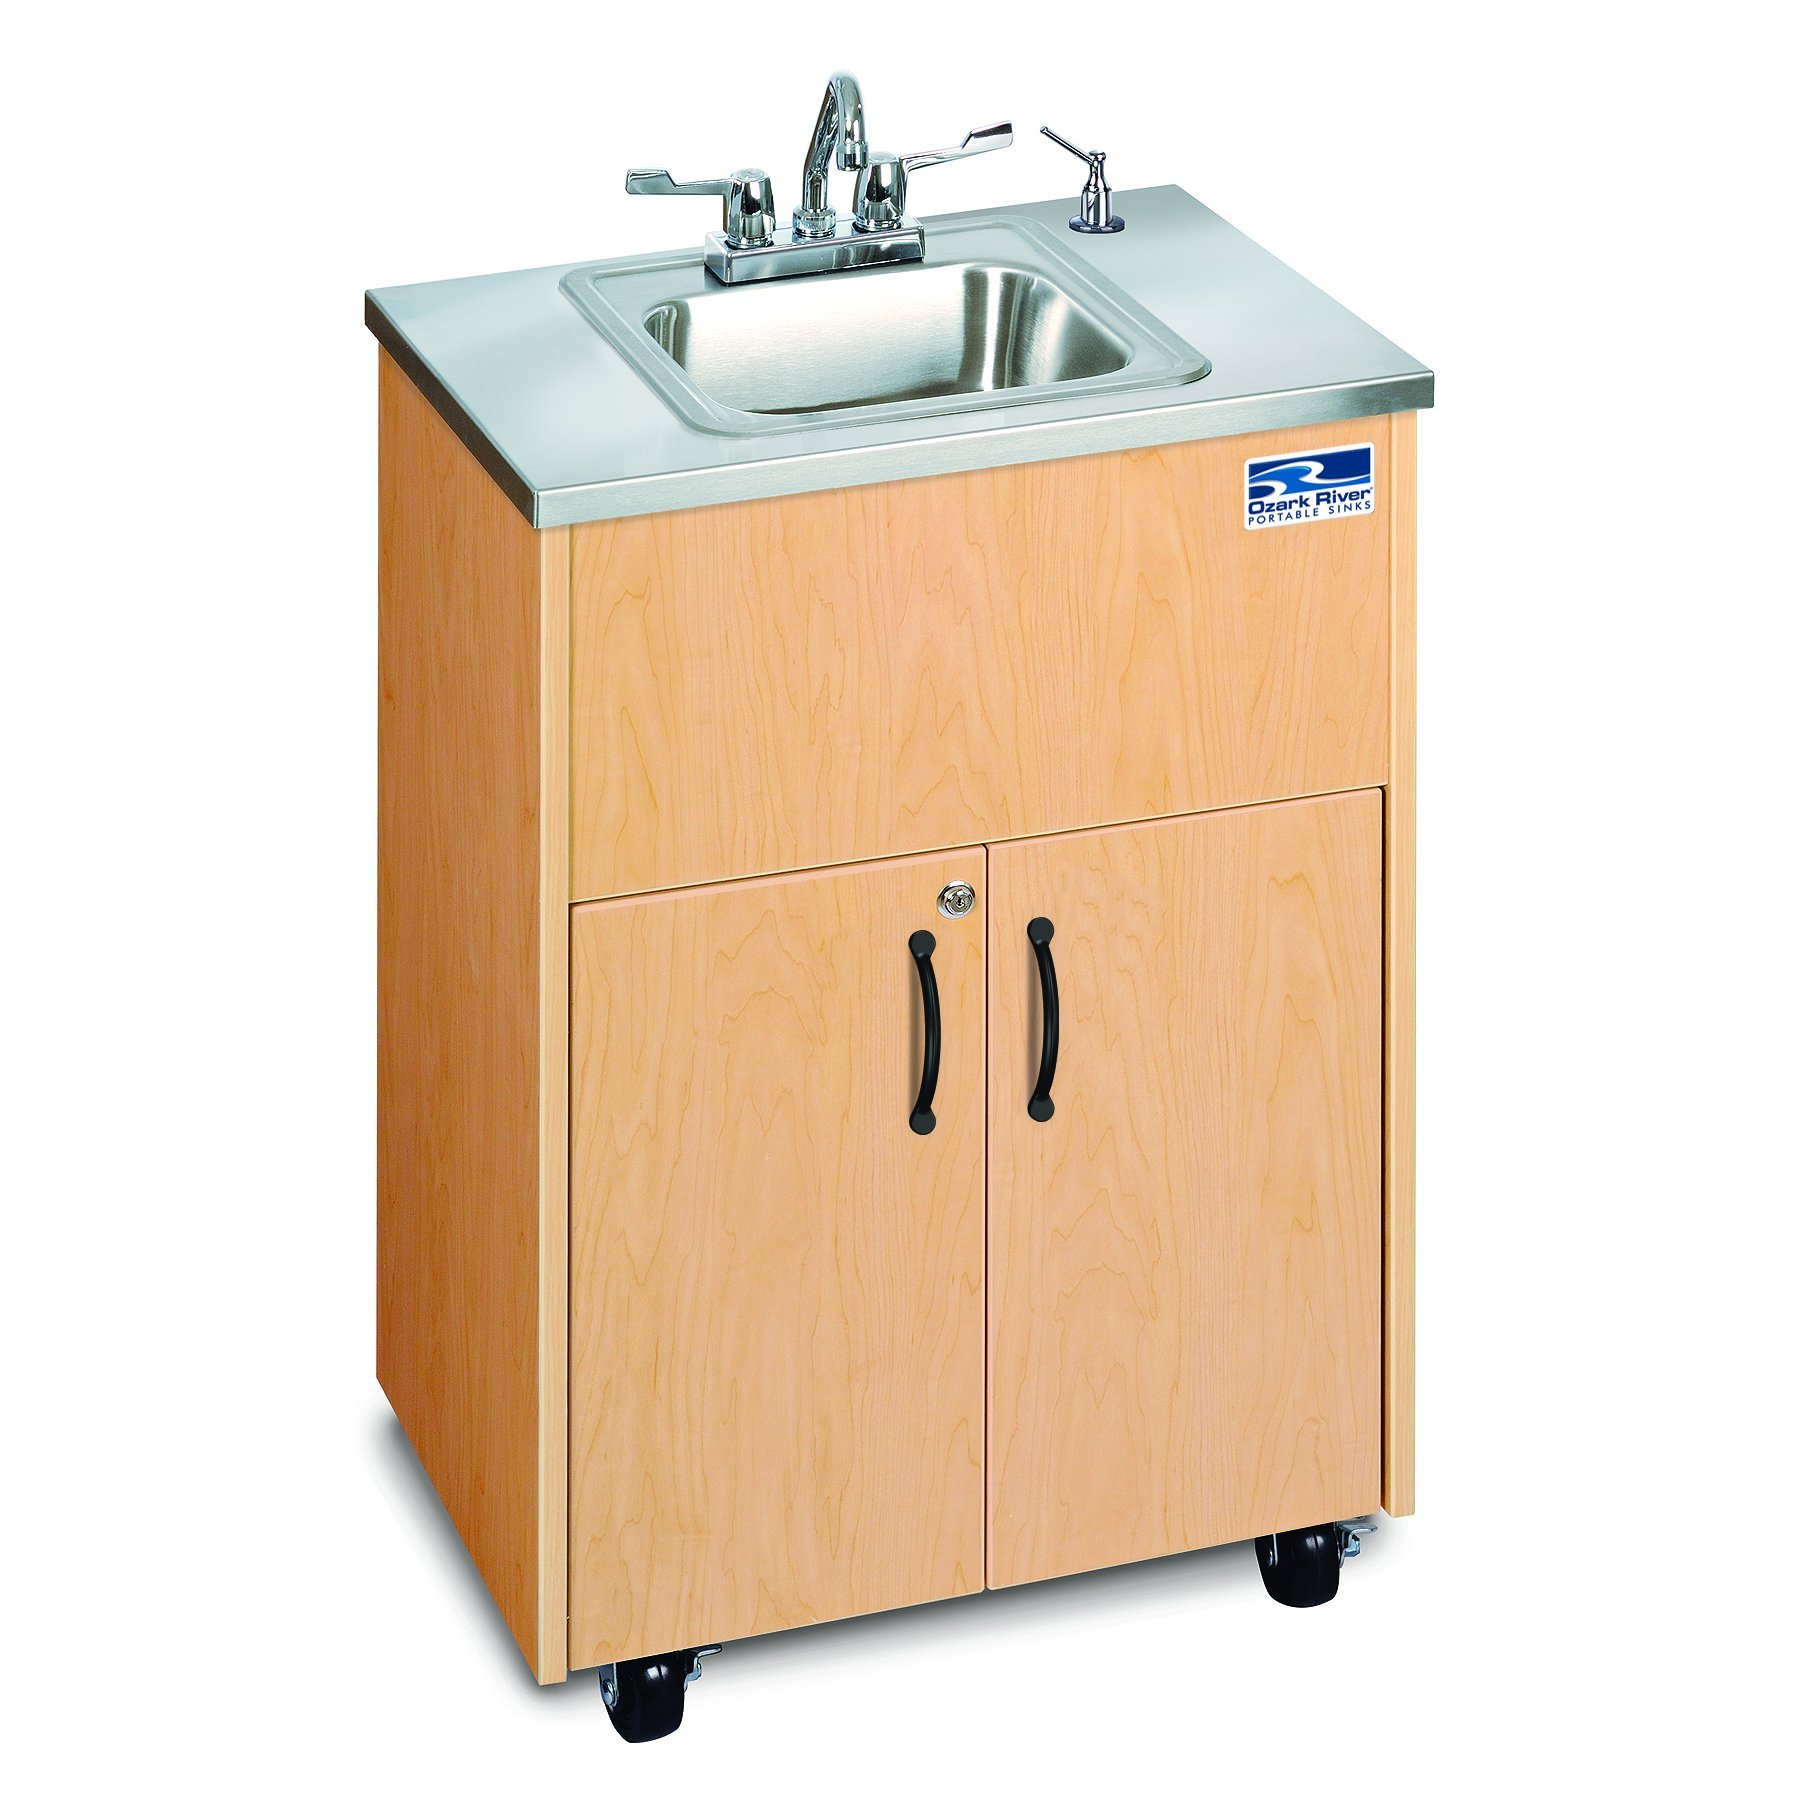 Ozark River Portable Sinks ADSTM-SS-SS1N Silver Premier 1 Portable hand washing station